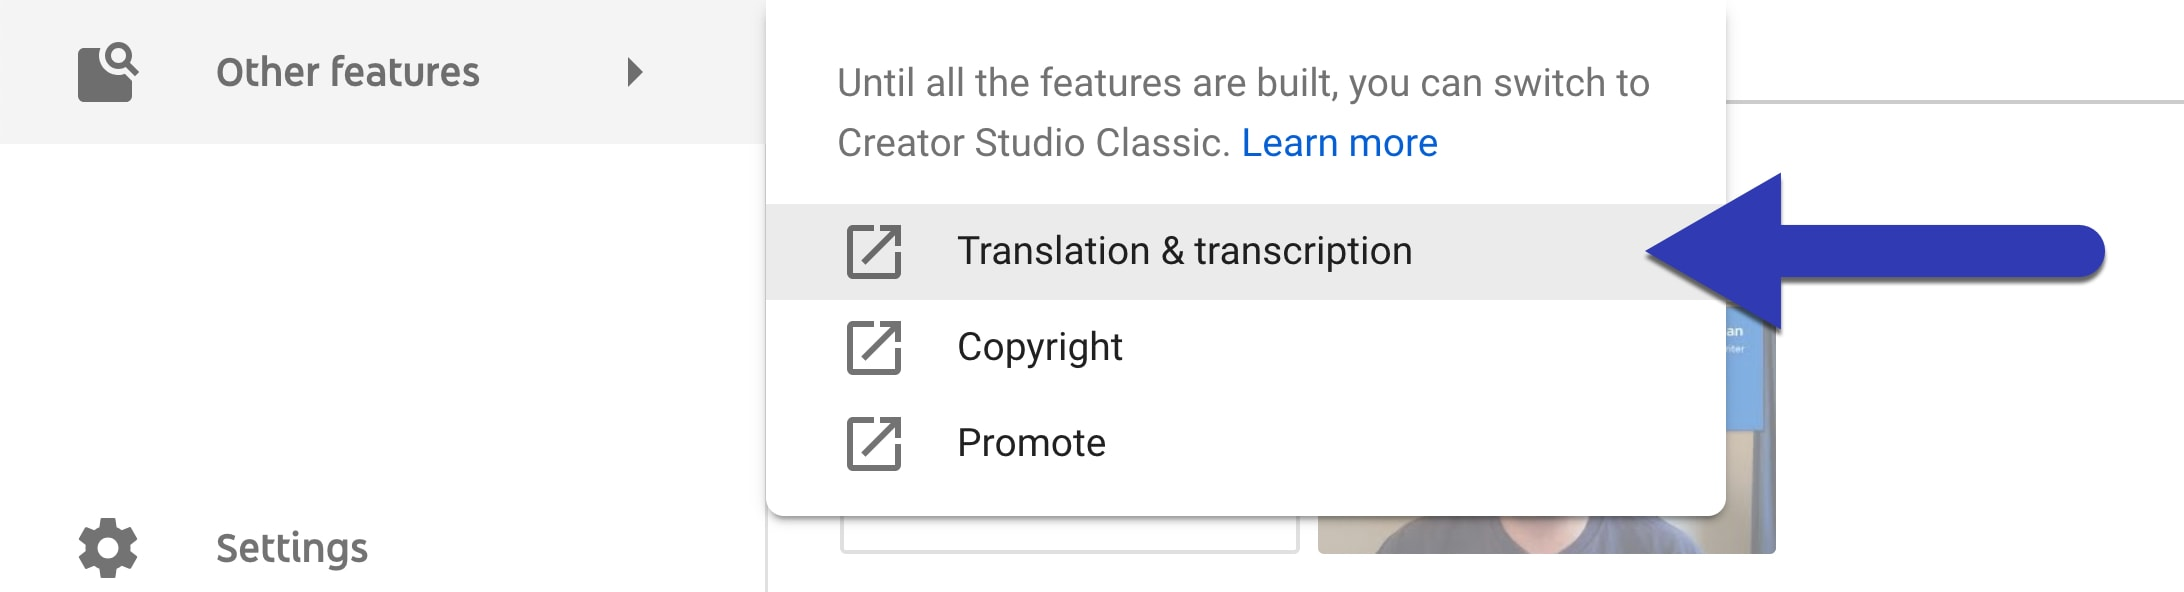 YouTube Translation & transcription option